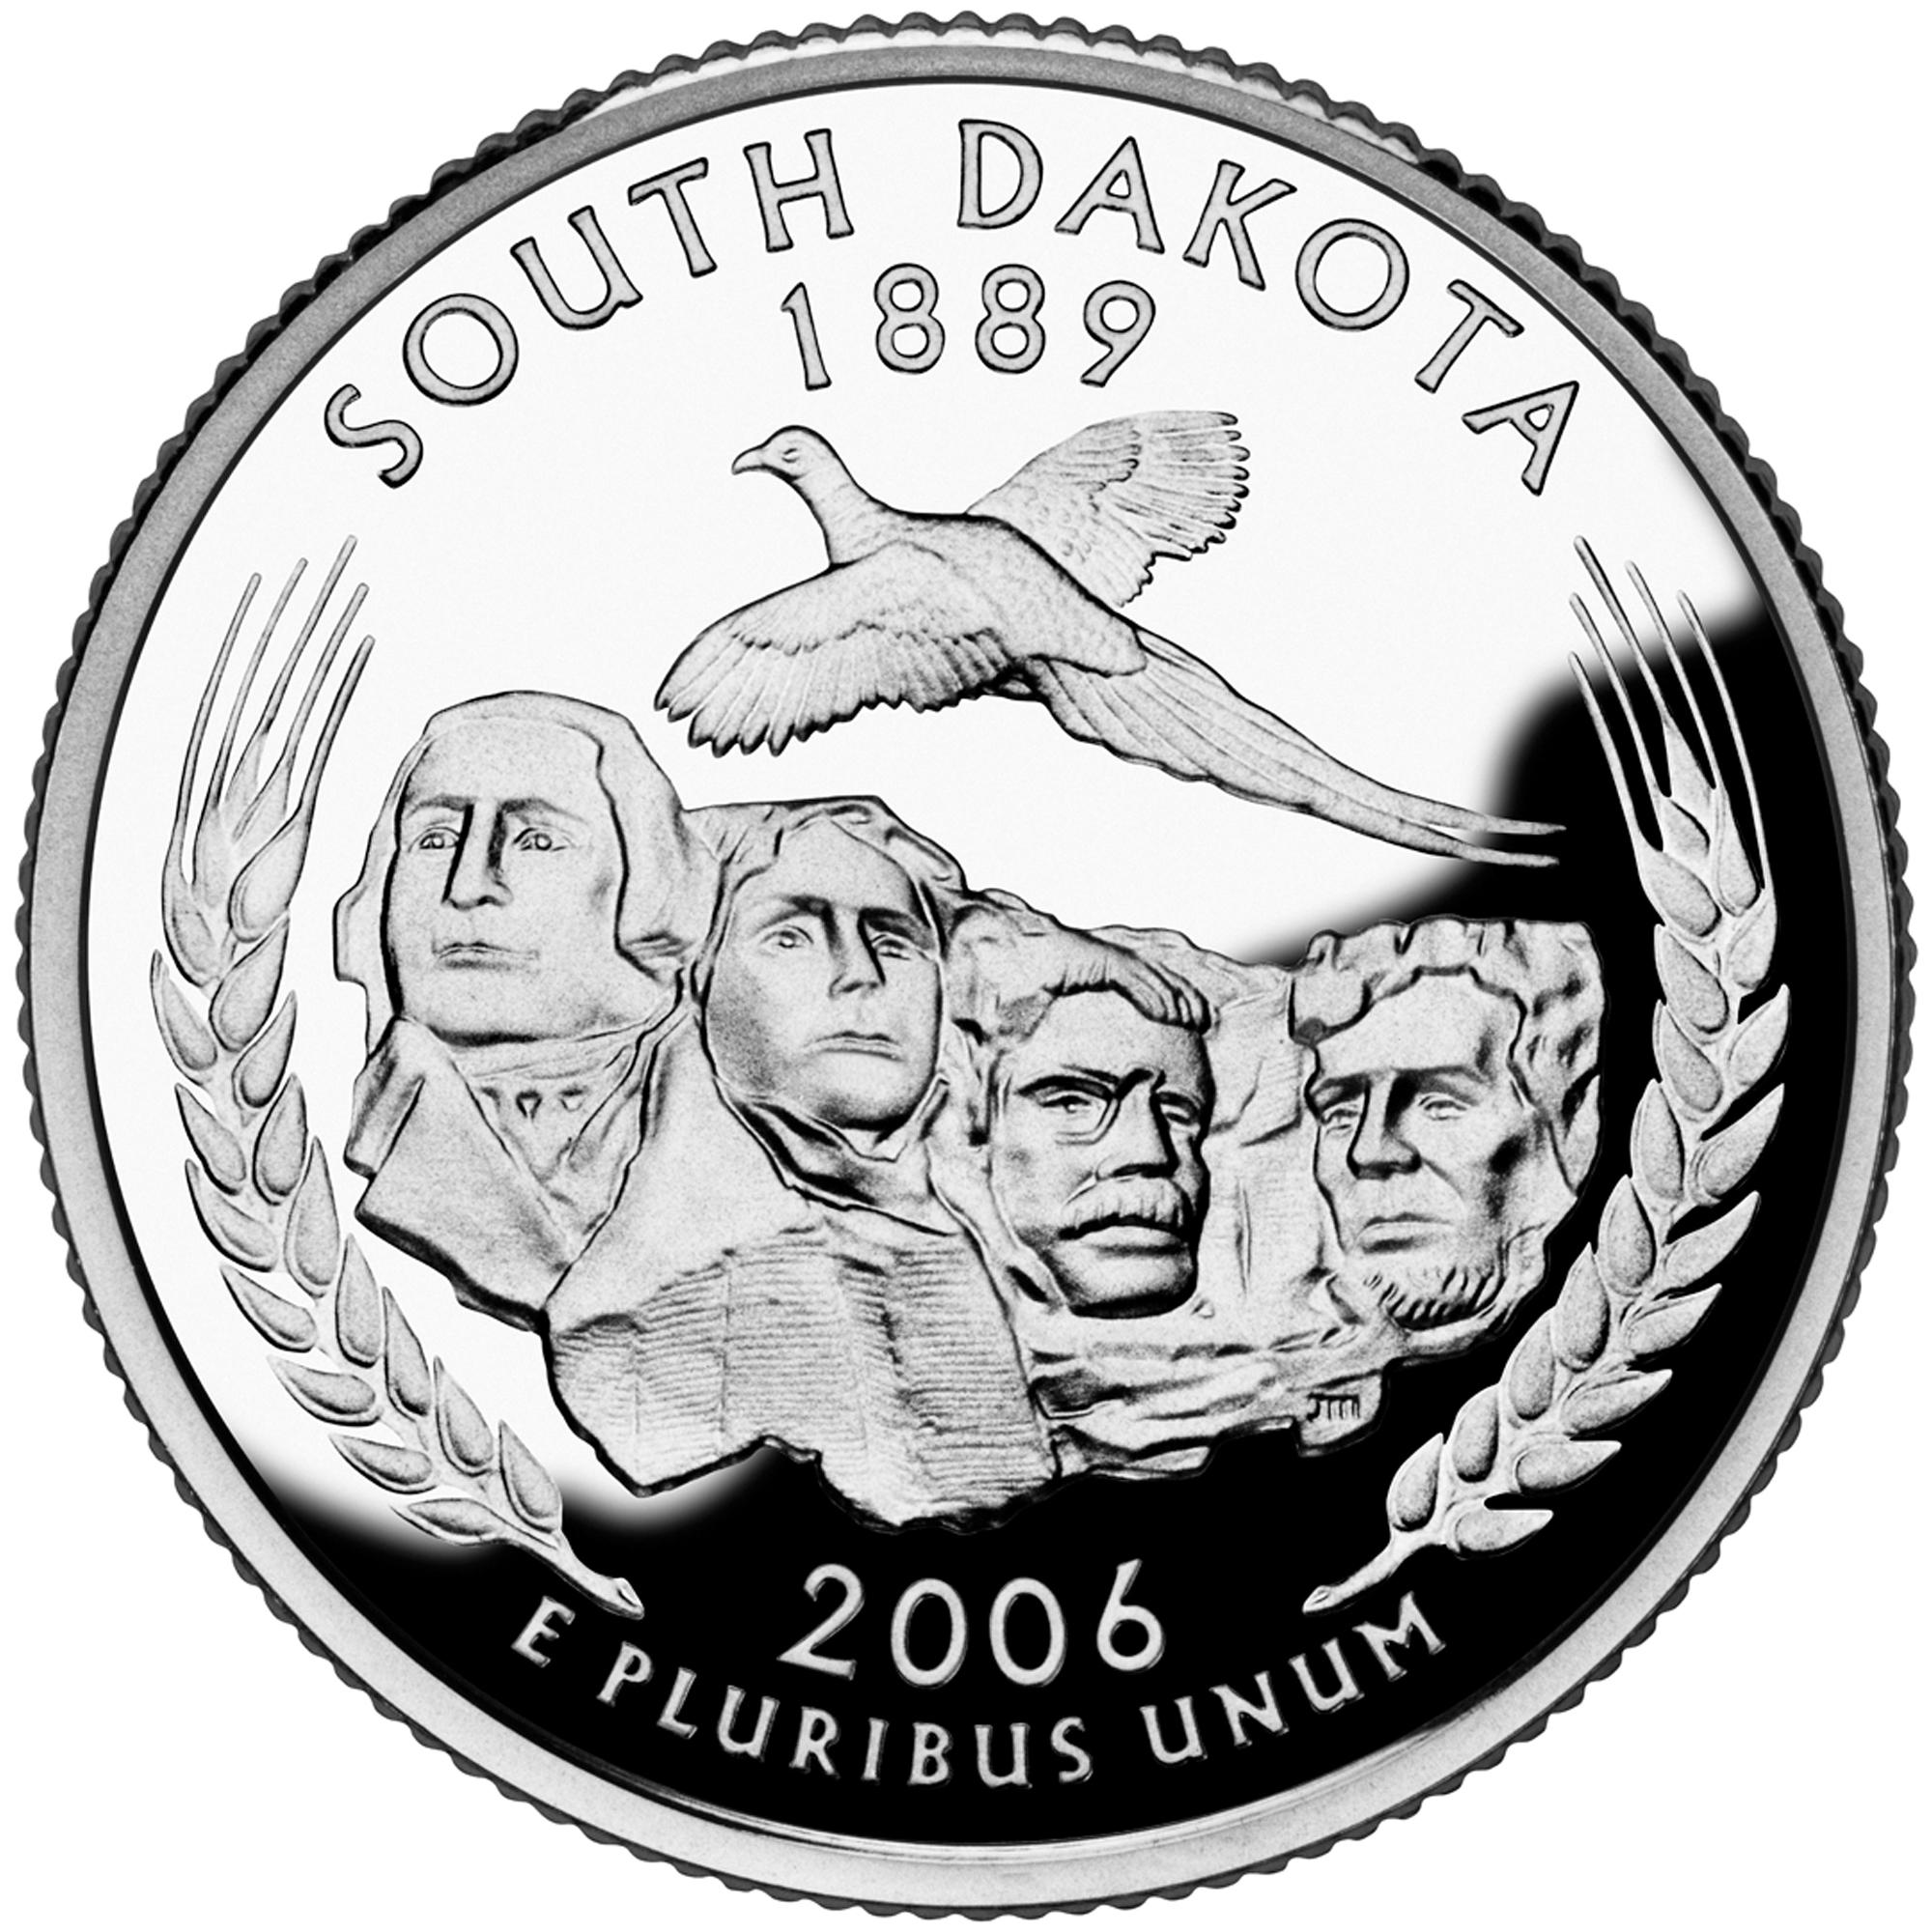 2006 50 State Quarters Coin South Dakota Proof Reverse